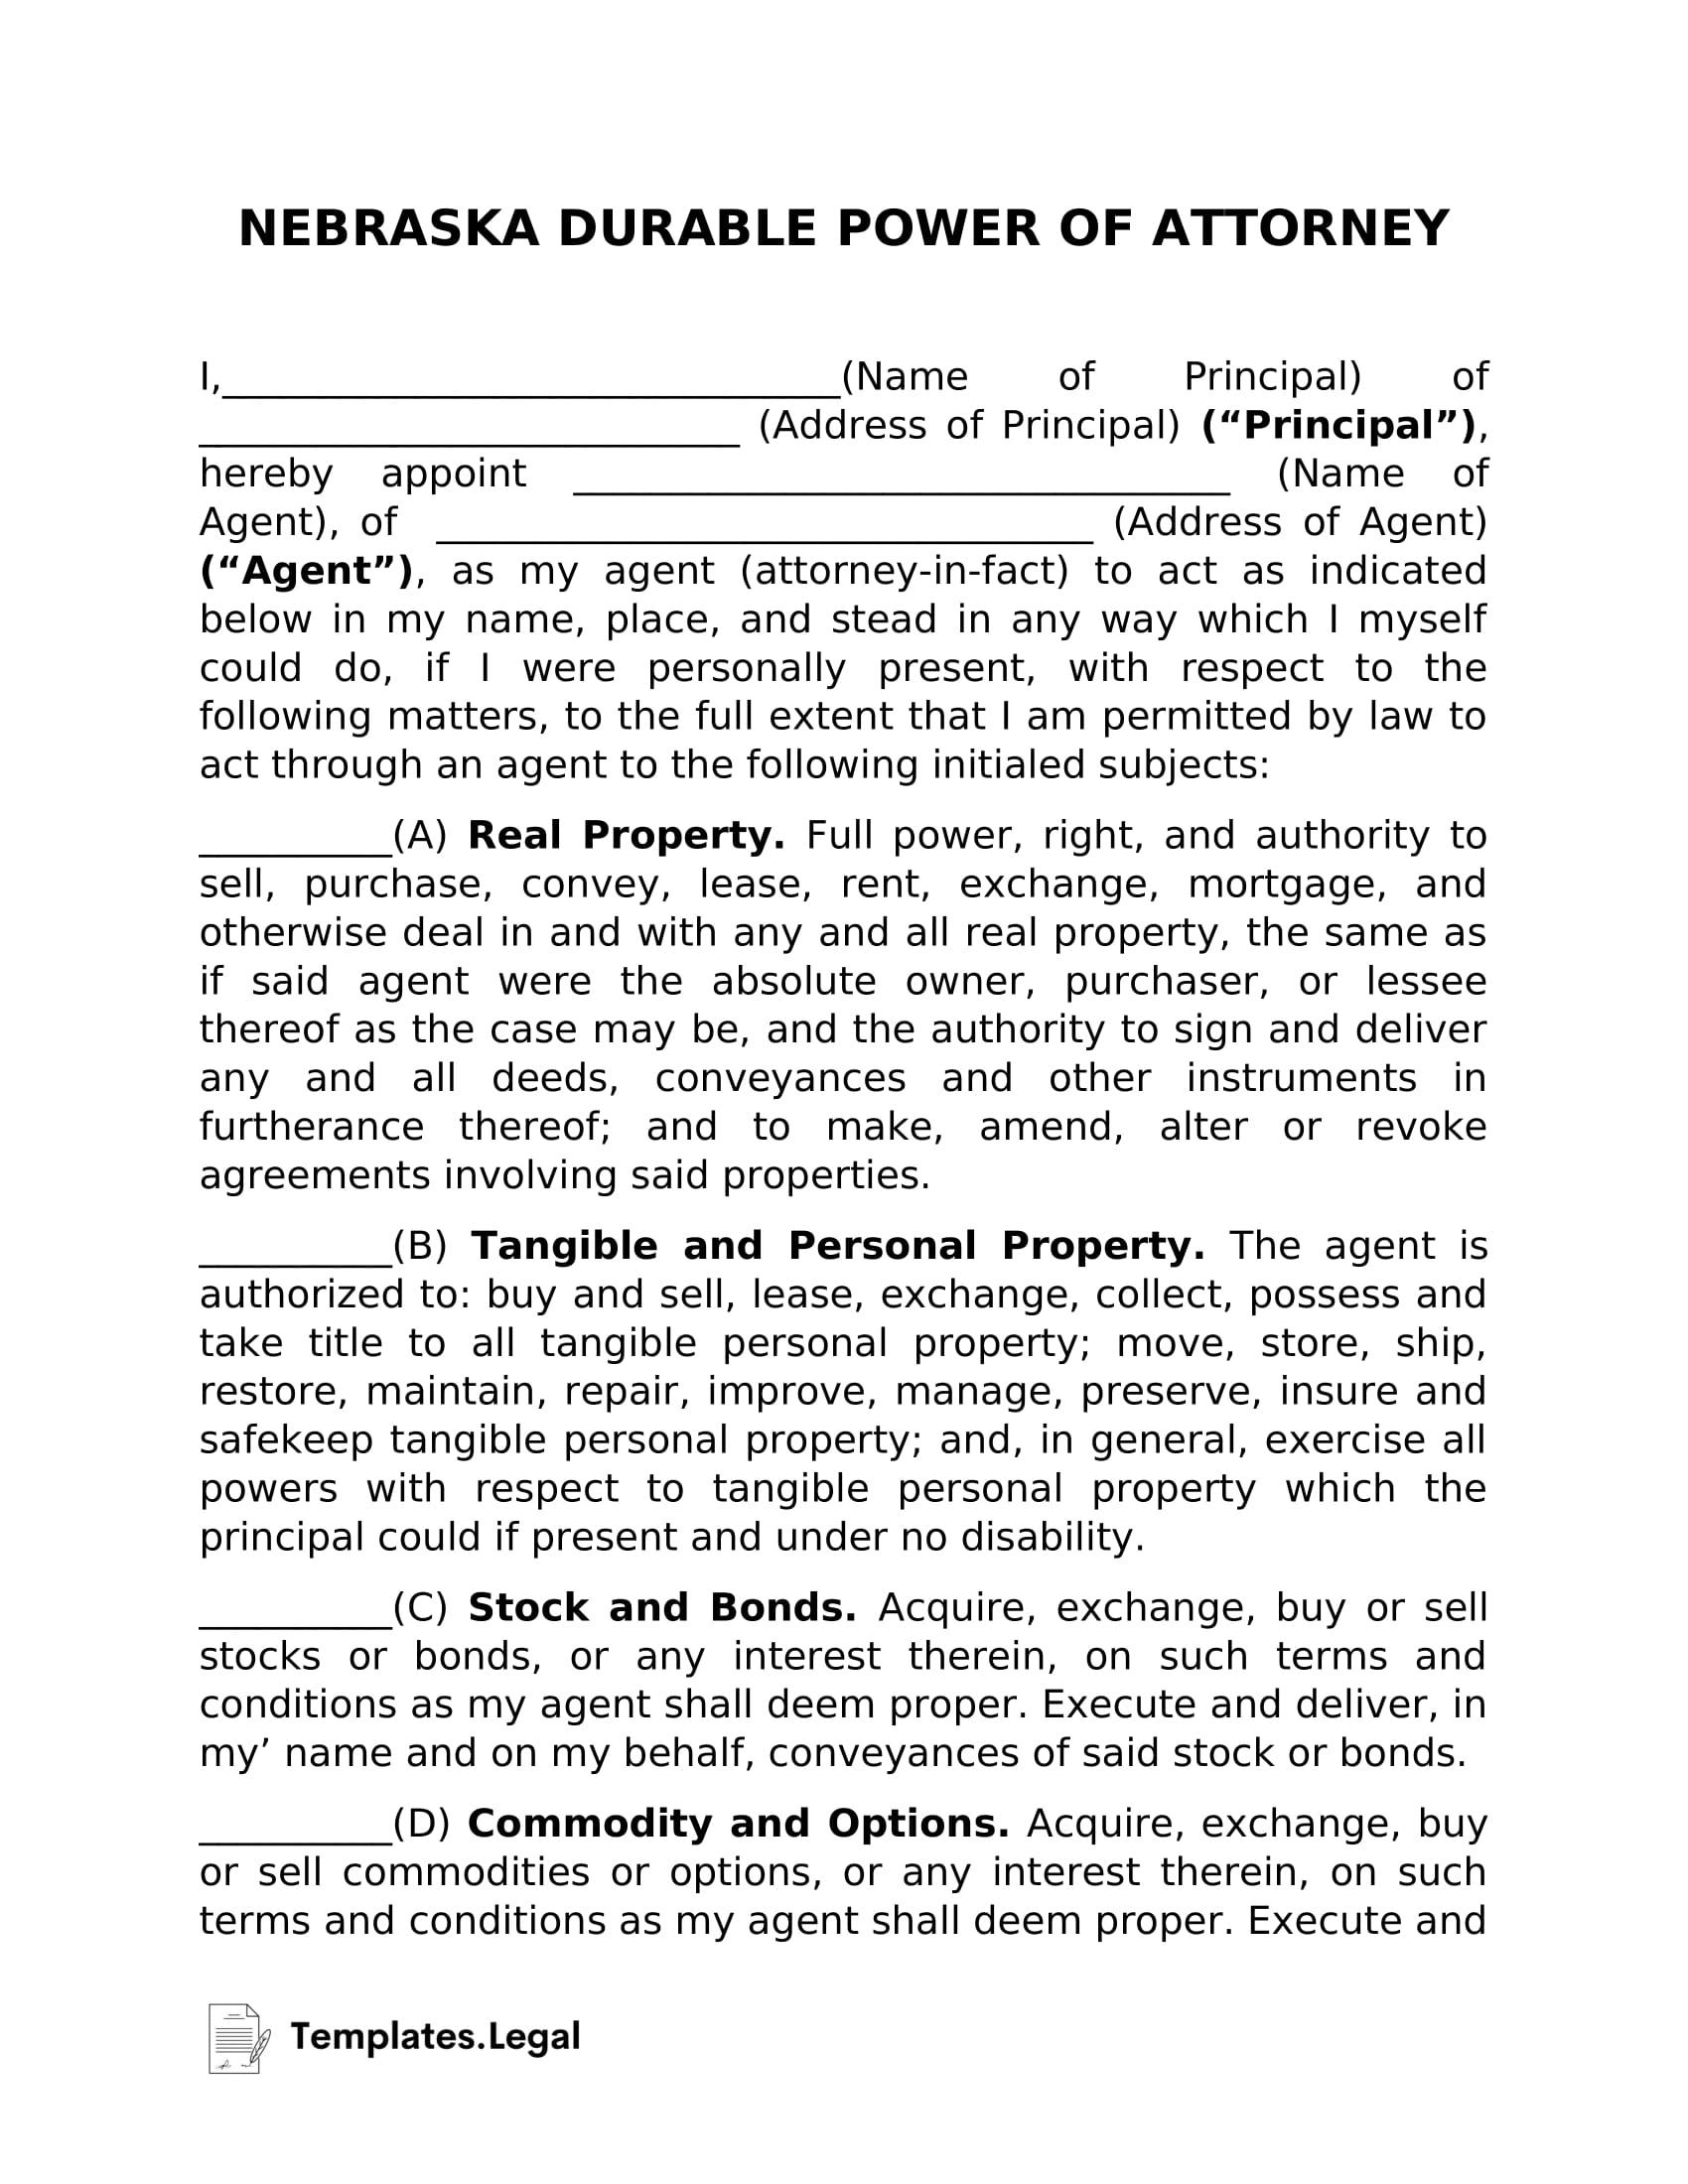 Nebraska Durable Power of Attorney - Templates.Legal